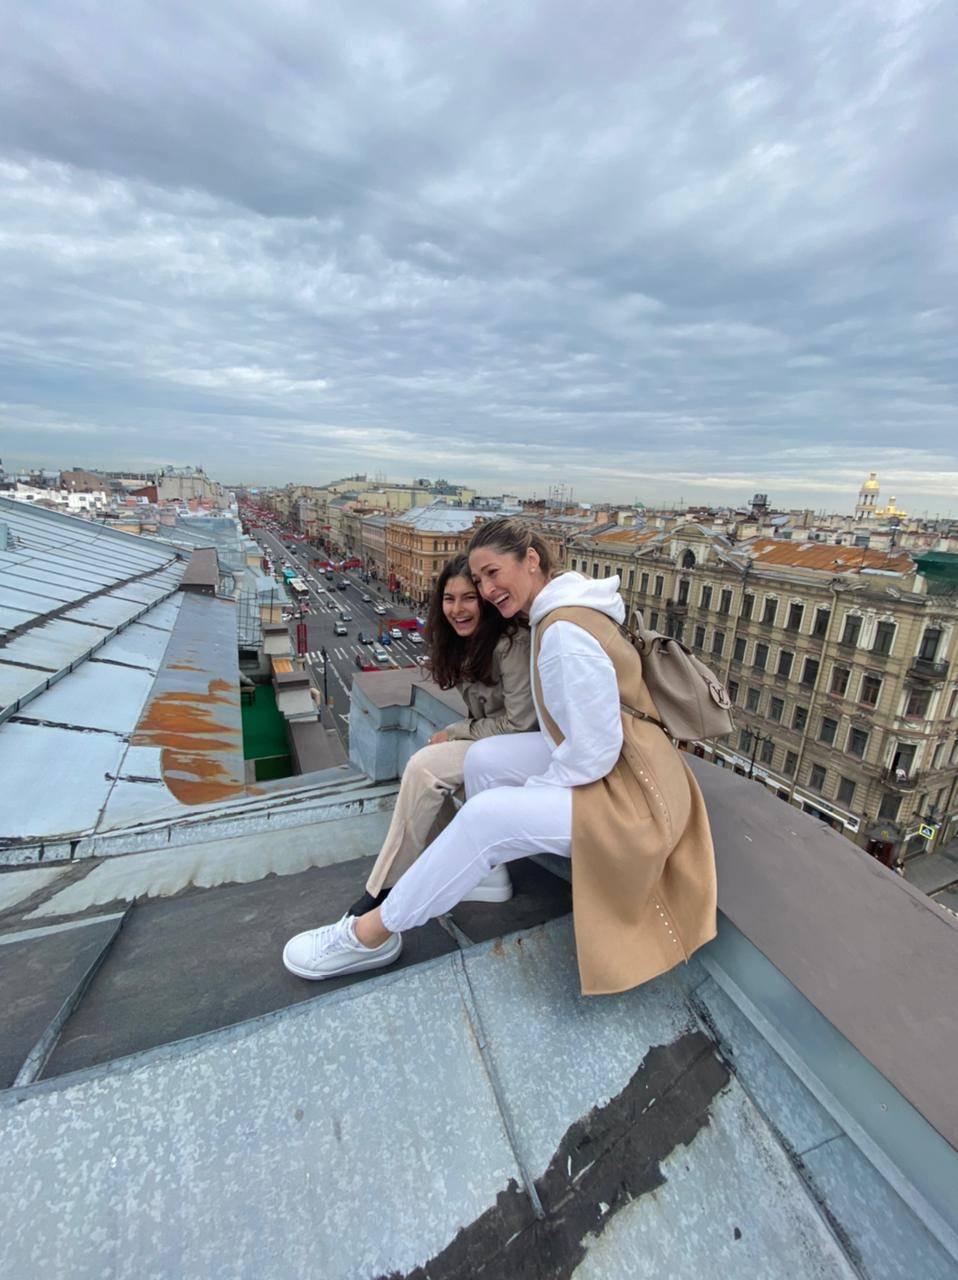 The duo enjoying rooftop views of St Petersburg